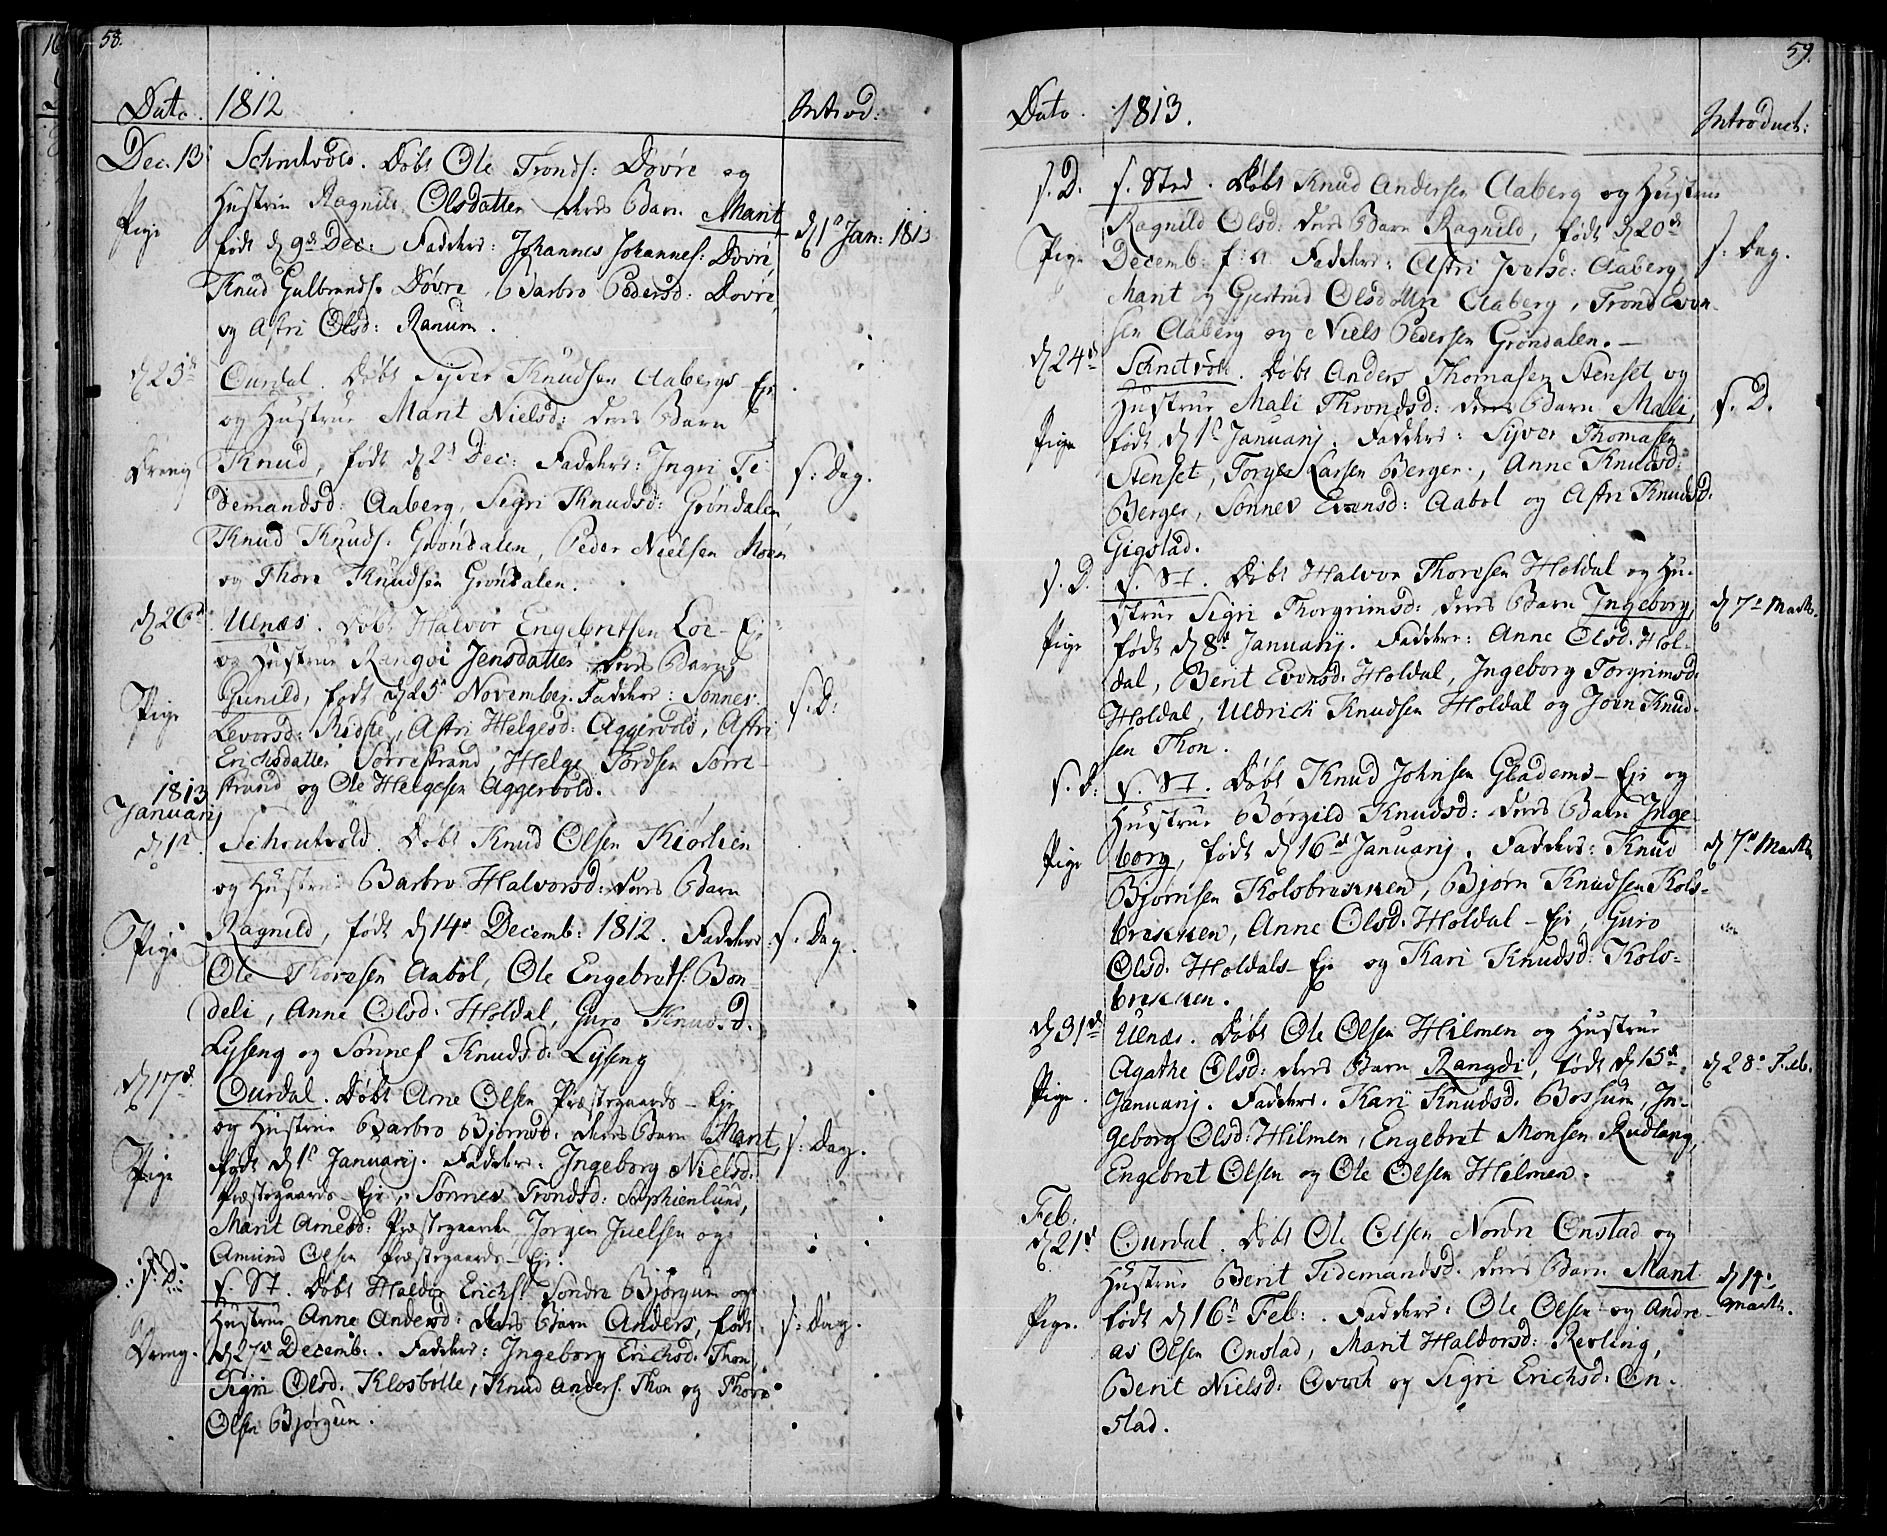 SAH, Nord-Aurdal prestekontor, Ministerialbok nr. 1, 1808-1815, s. 58-59